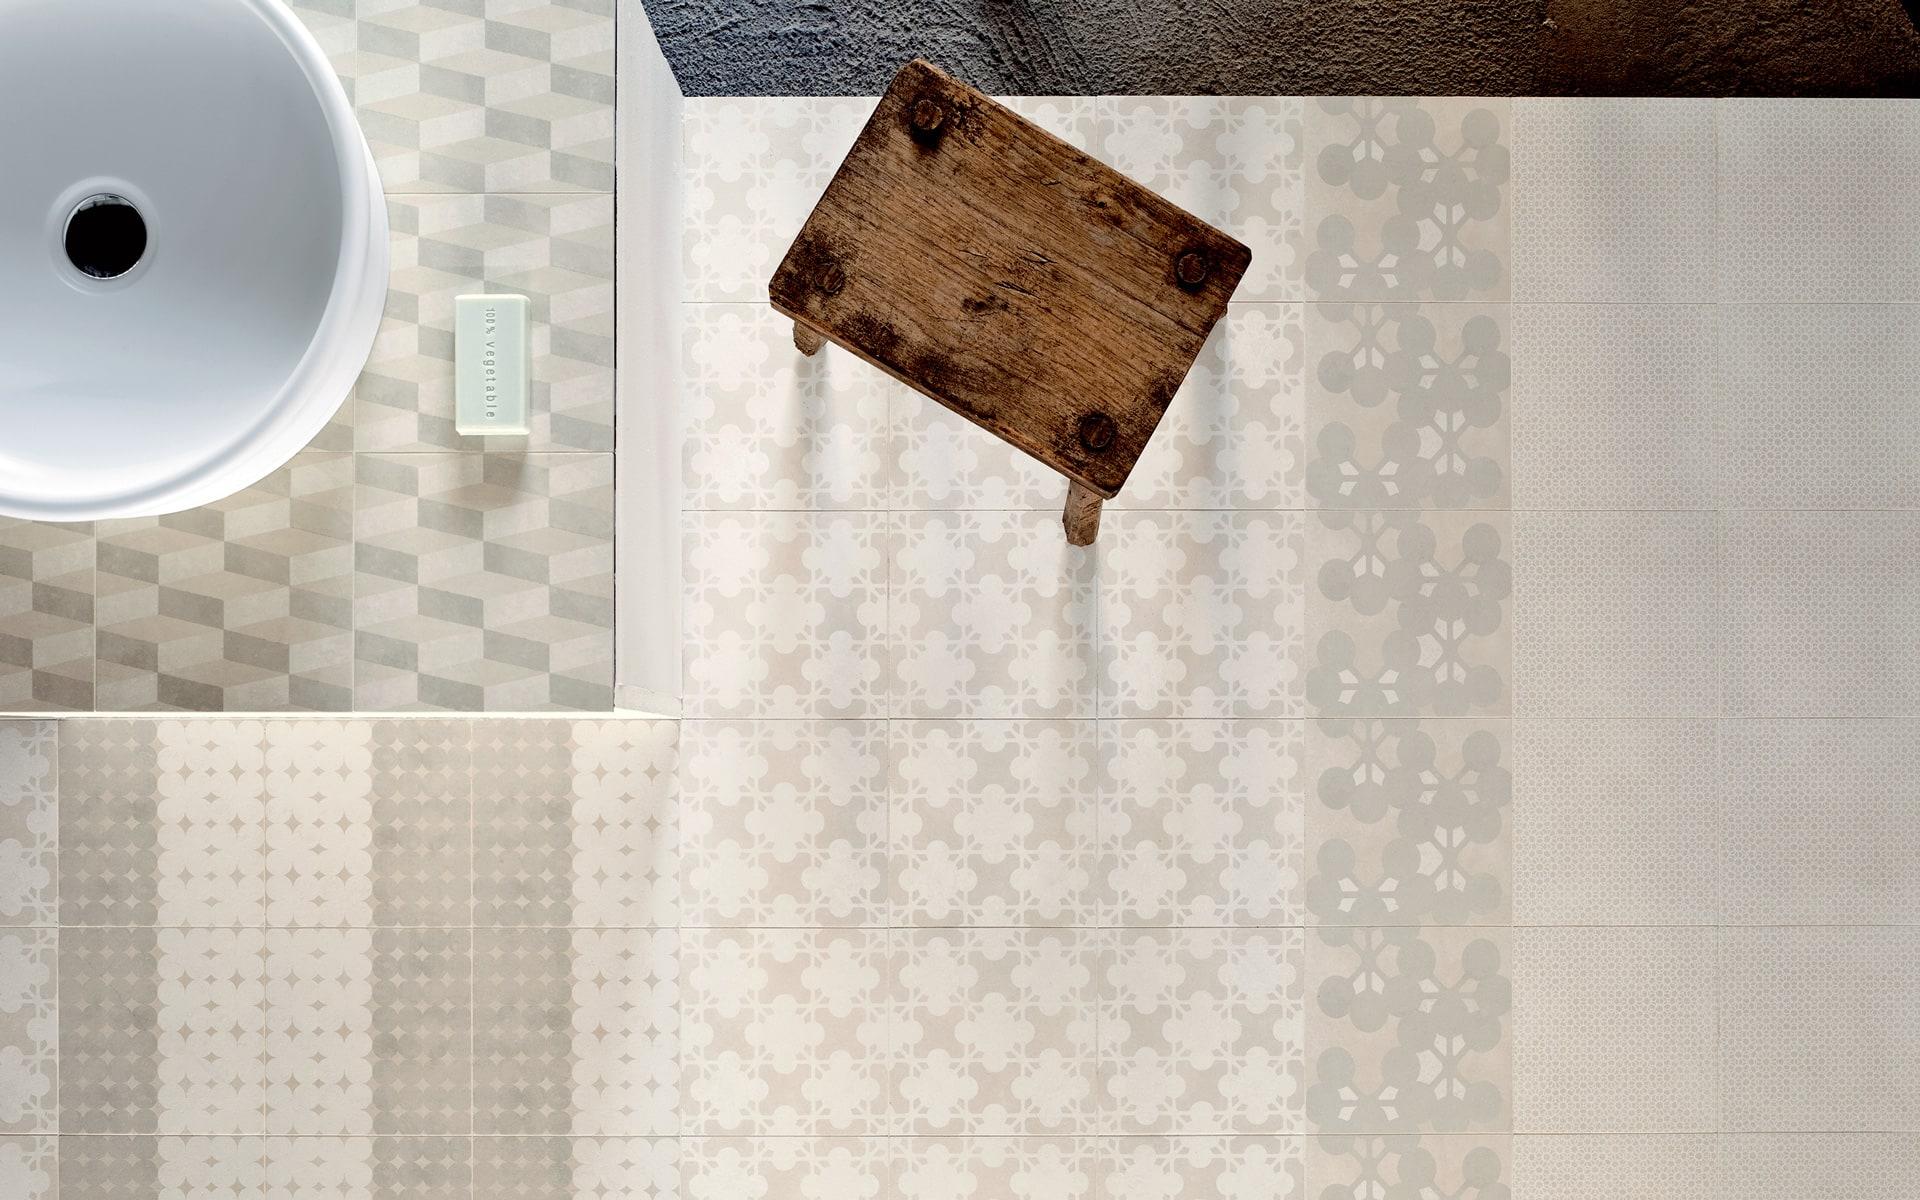 127_n_1---Azulej-Binaco-_-cubo,-trevo,-estrela,-flores,-renda